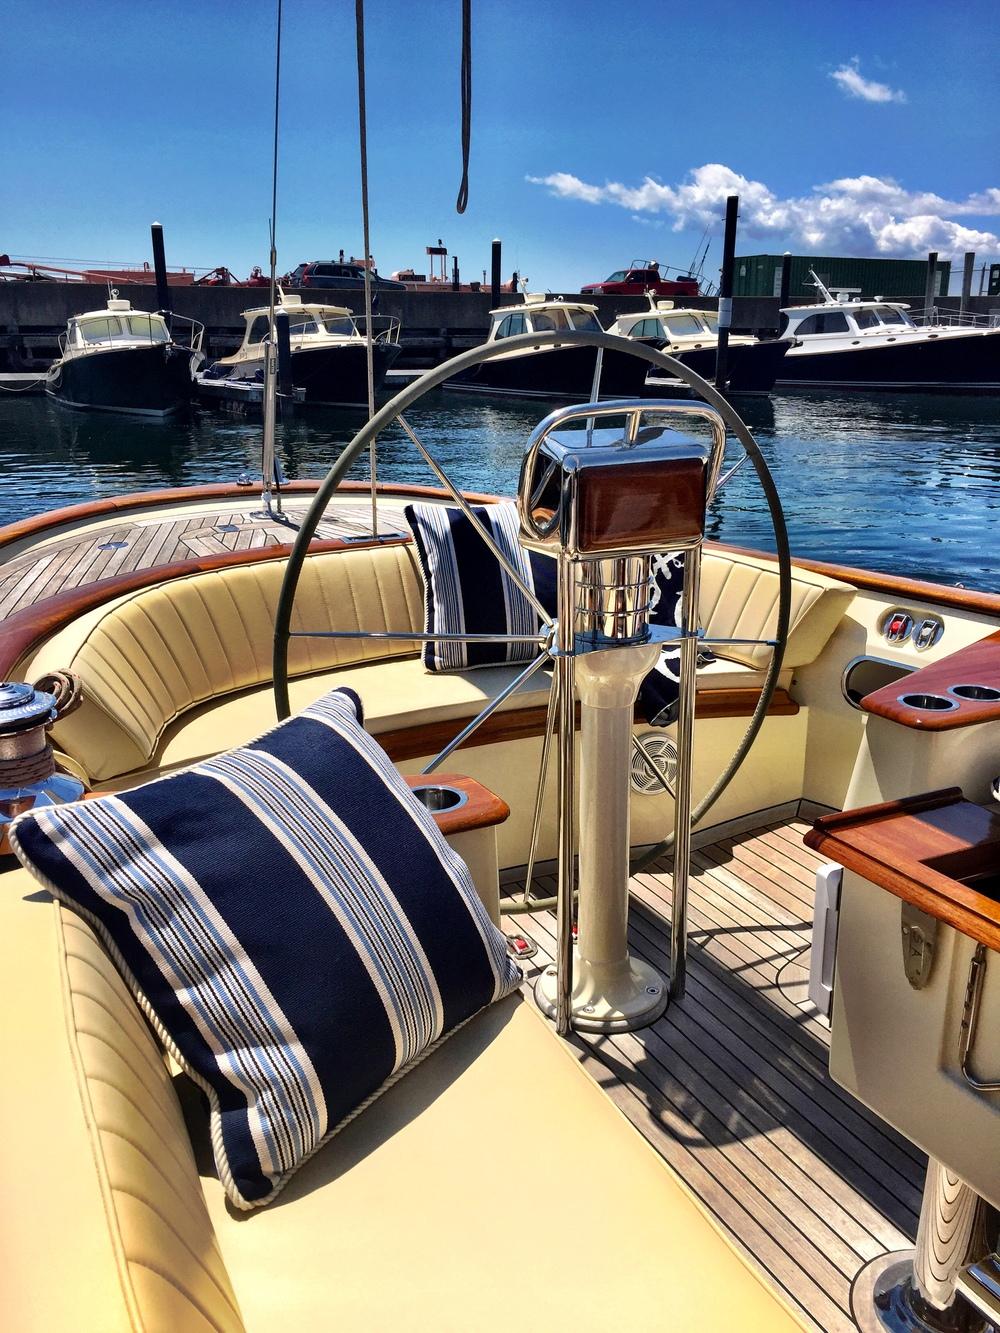 Maloney_Interiors_Boat_Cushions_Upholstery_Refit_Rhode_Island_Massachusetts.JPG